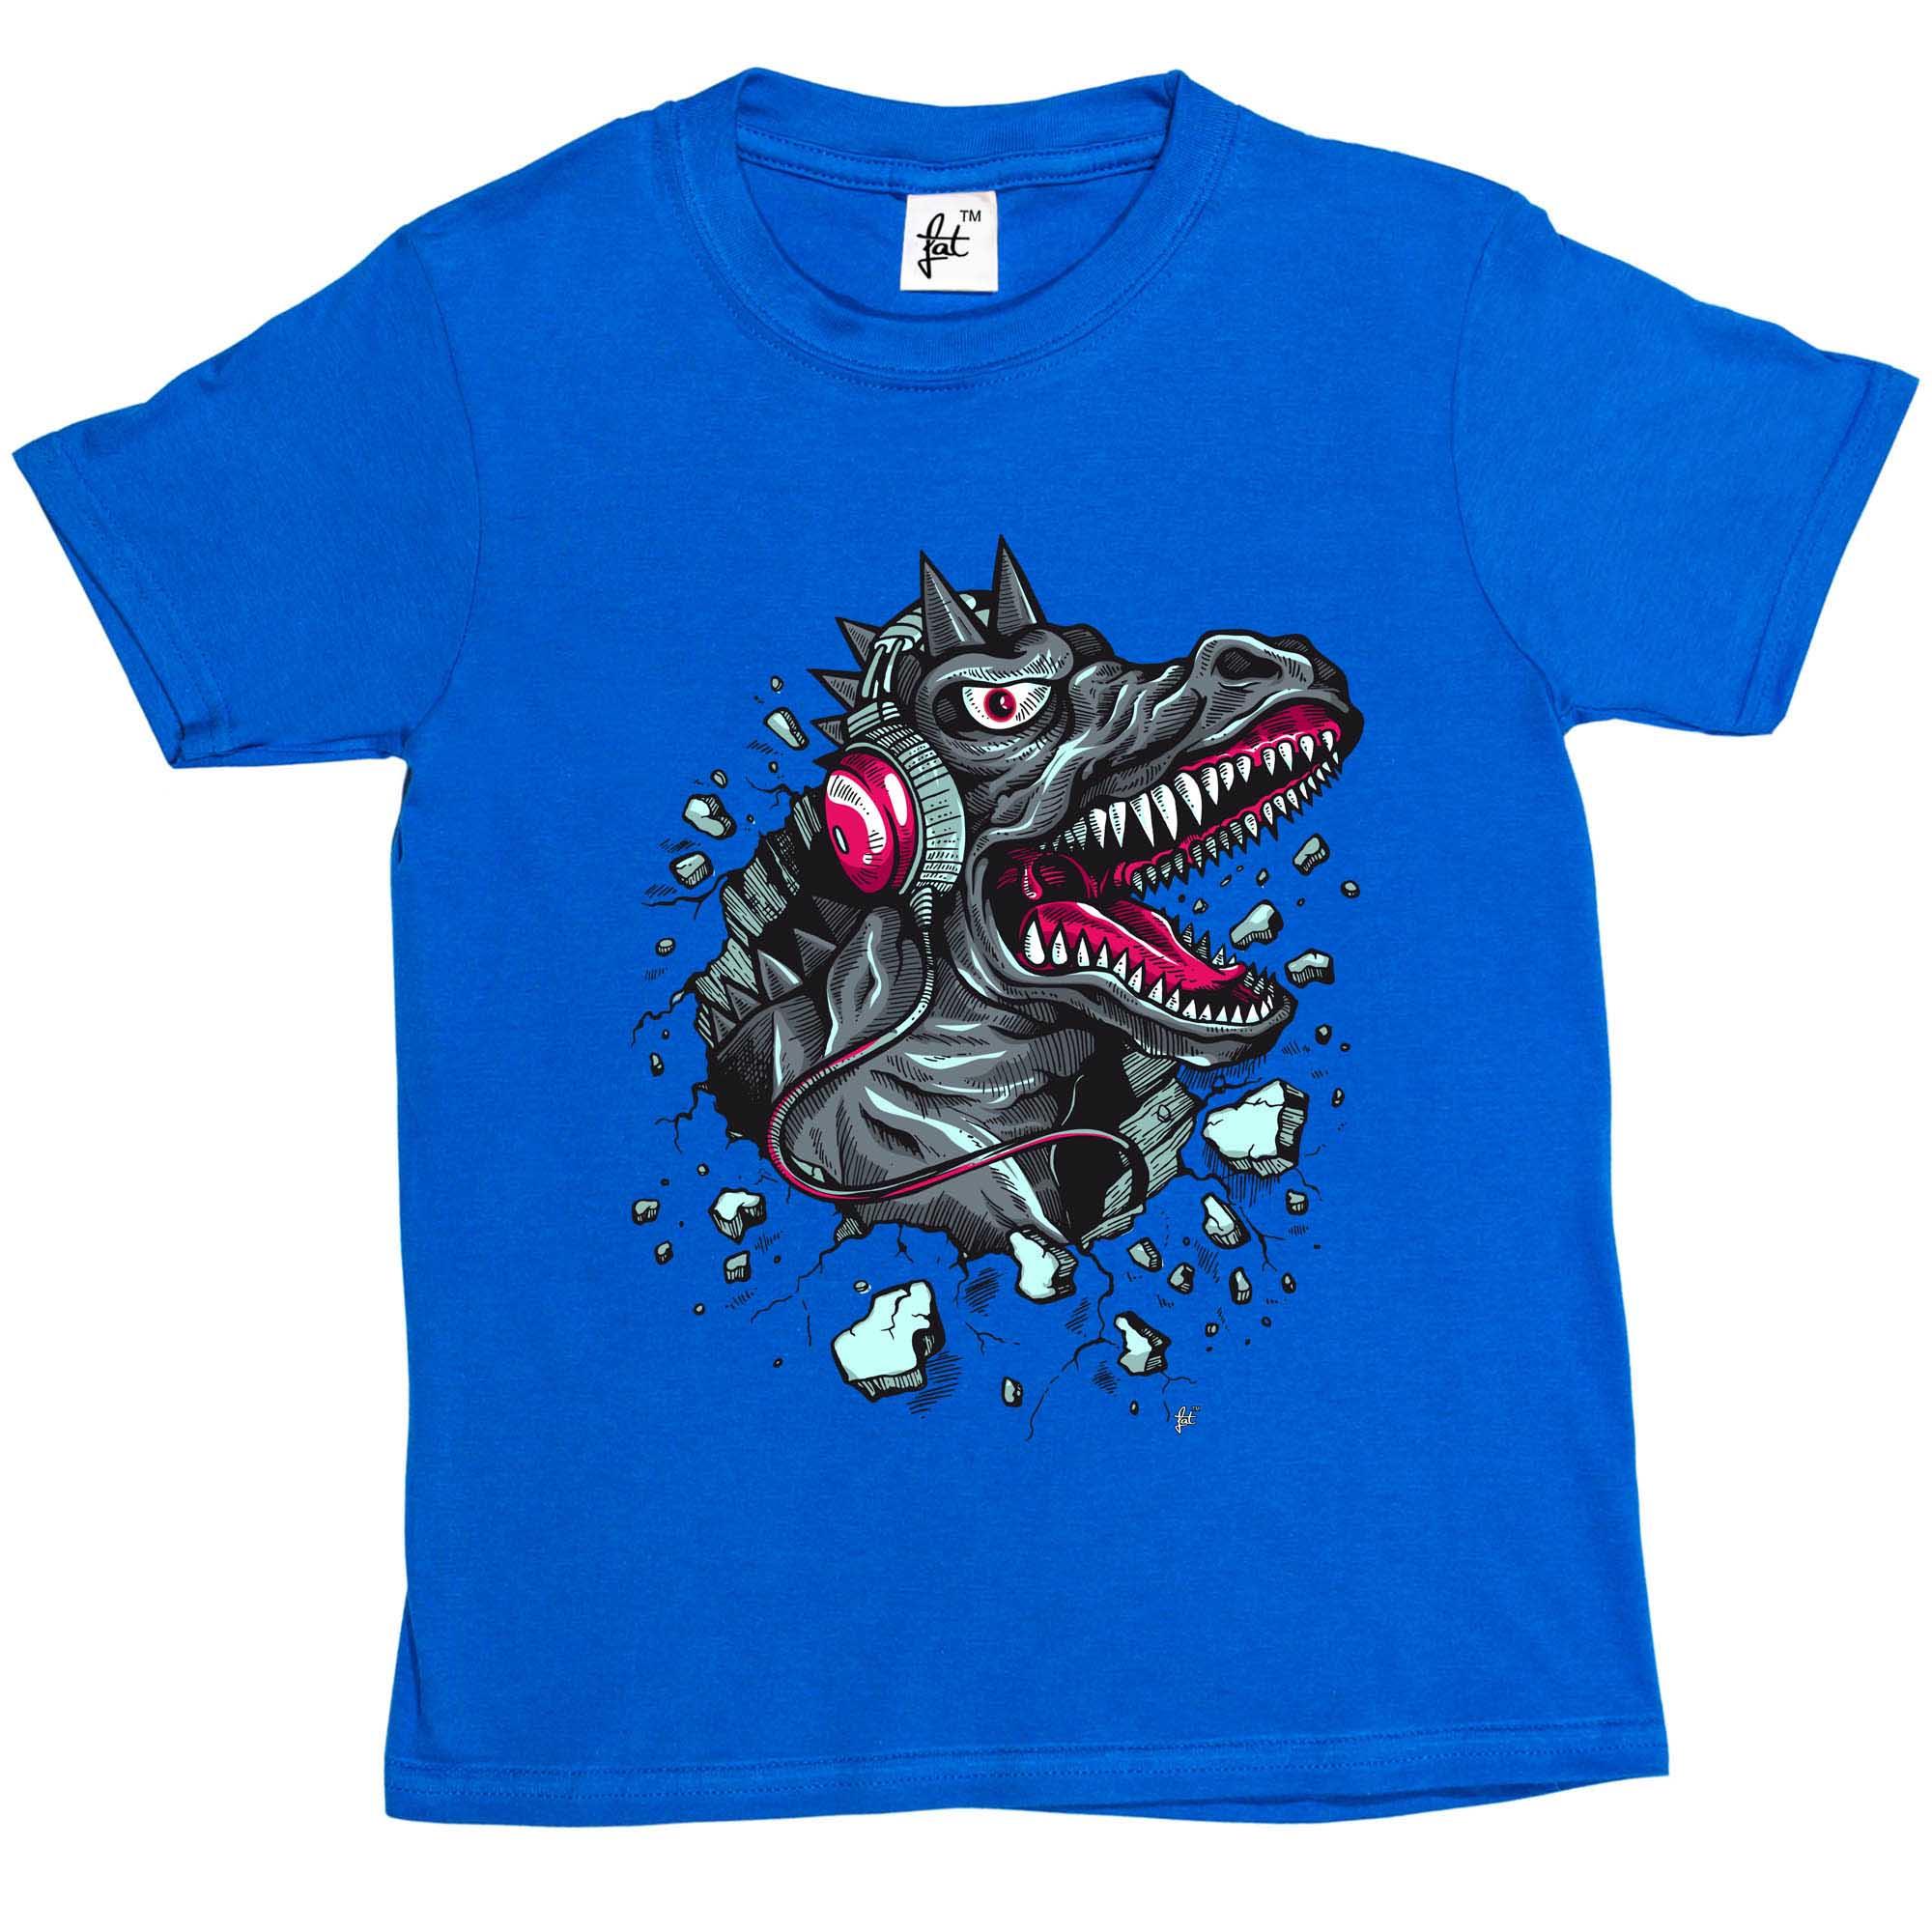 Dinosaur Breaking Through Wearing Headphones Kids Boys Girls T-Shirt